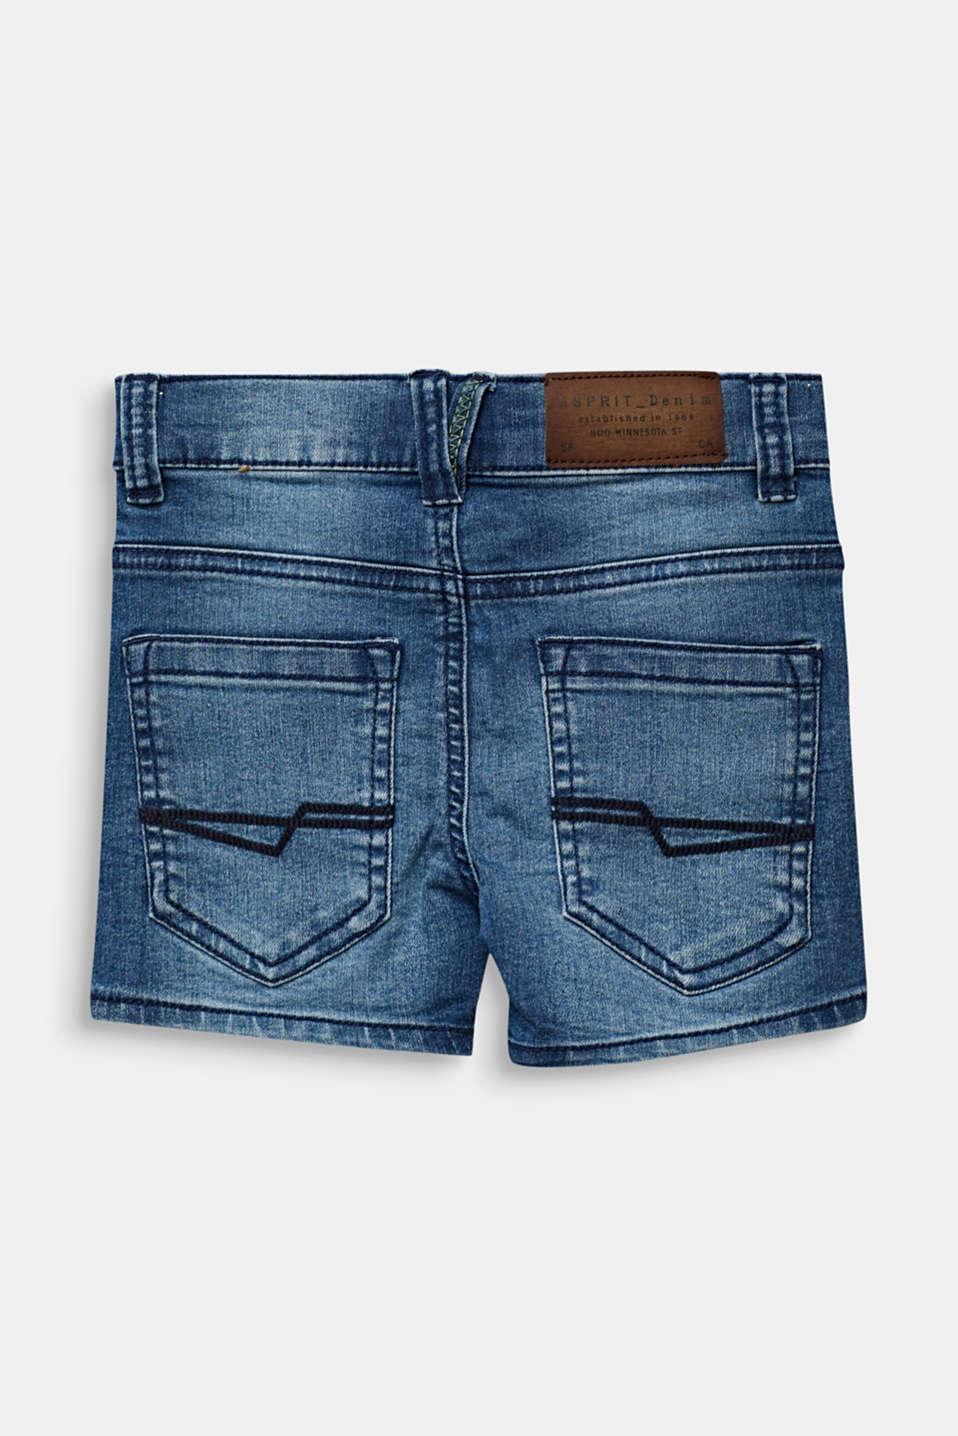 Denim shorts with an adjustable waistband, LIGHT INDIGO D, detail image number 1